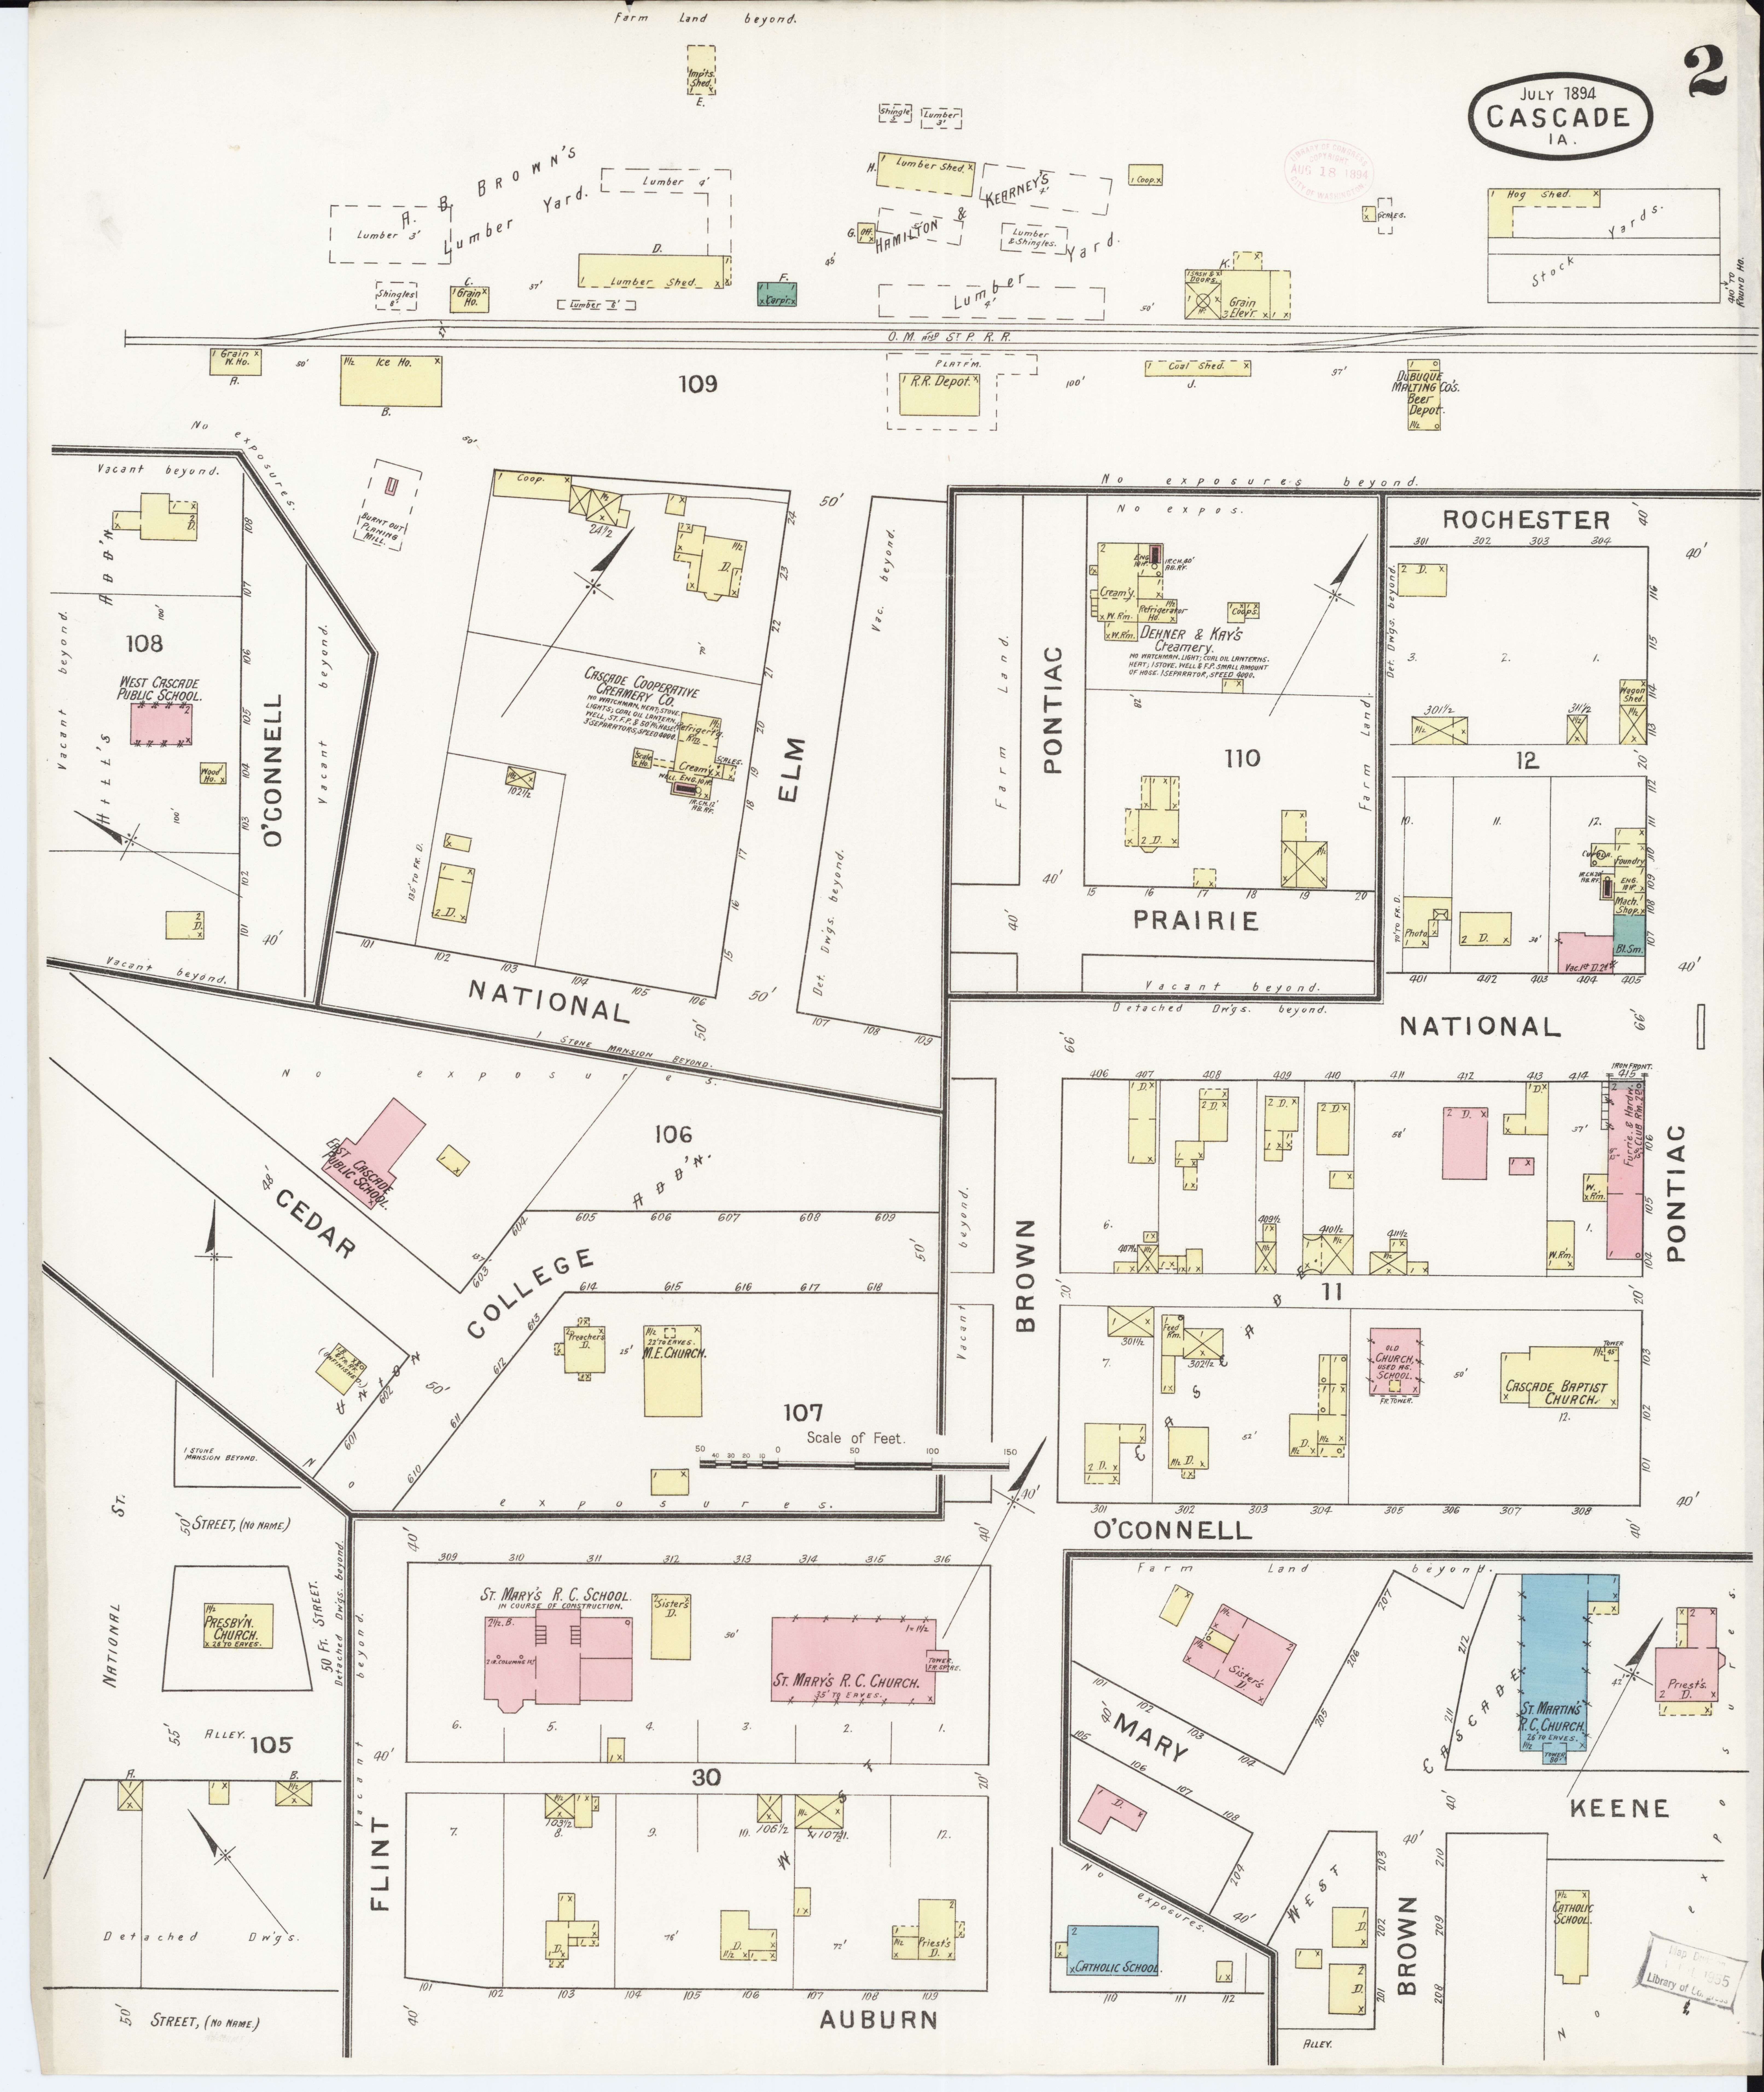 Cascade Iowa Map.File Sanborn Fire Insurance Map From Cascade Dubuque And Jones